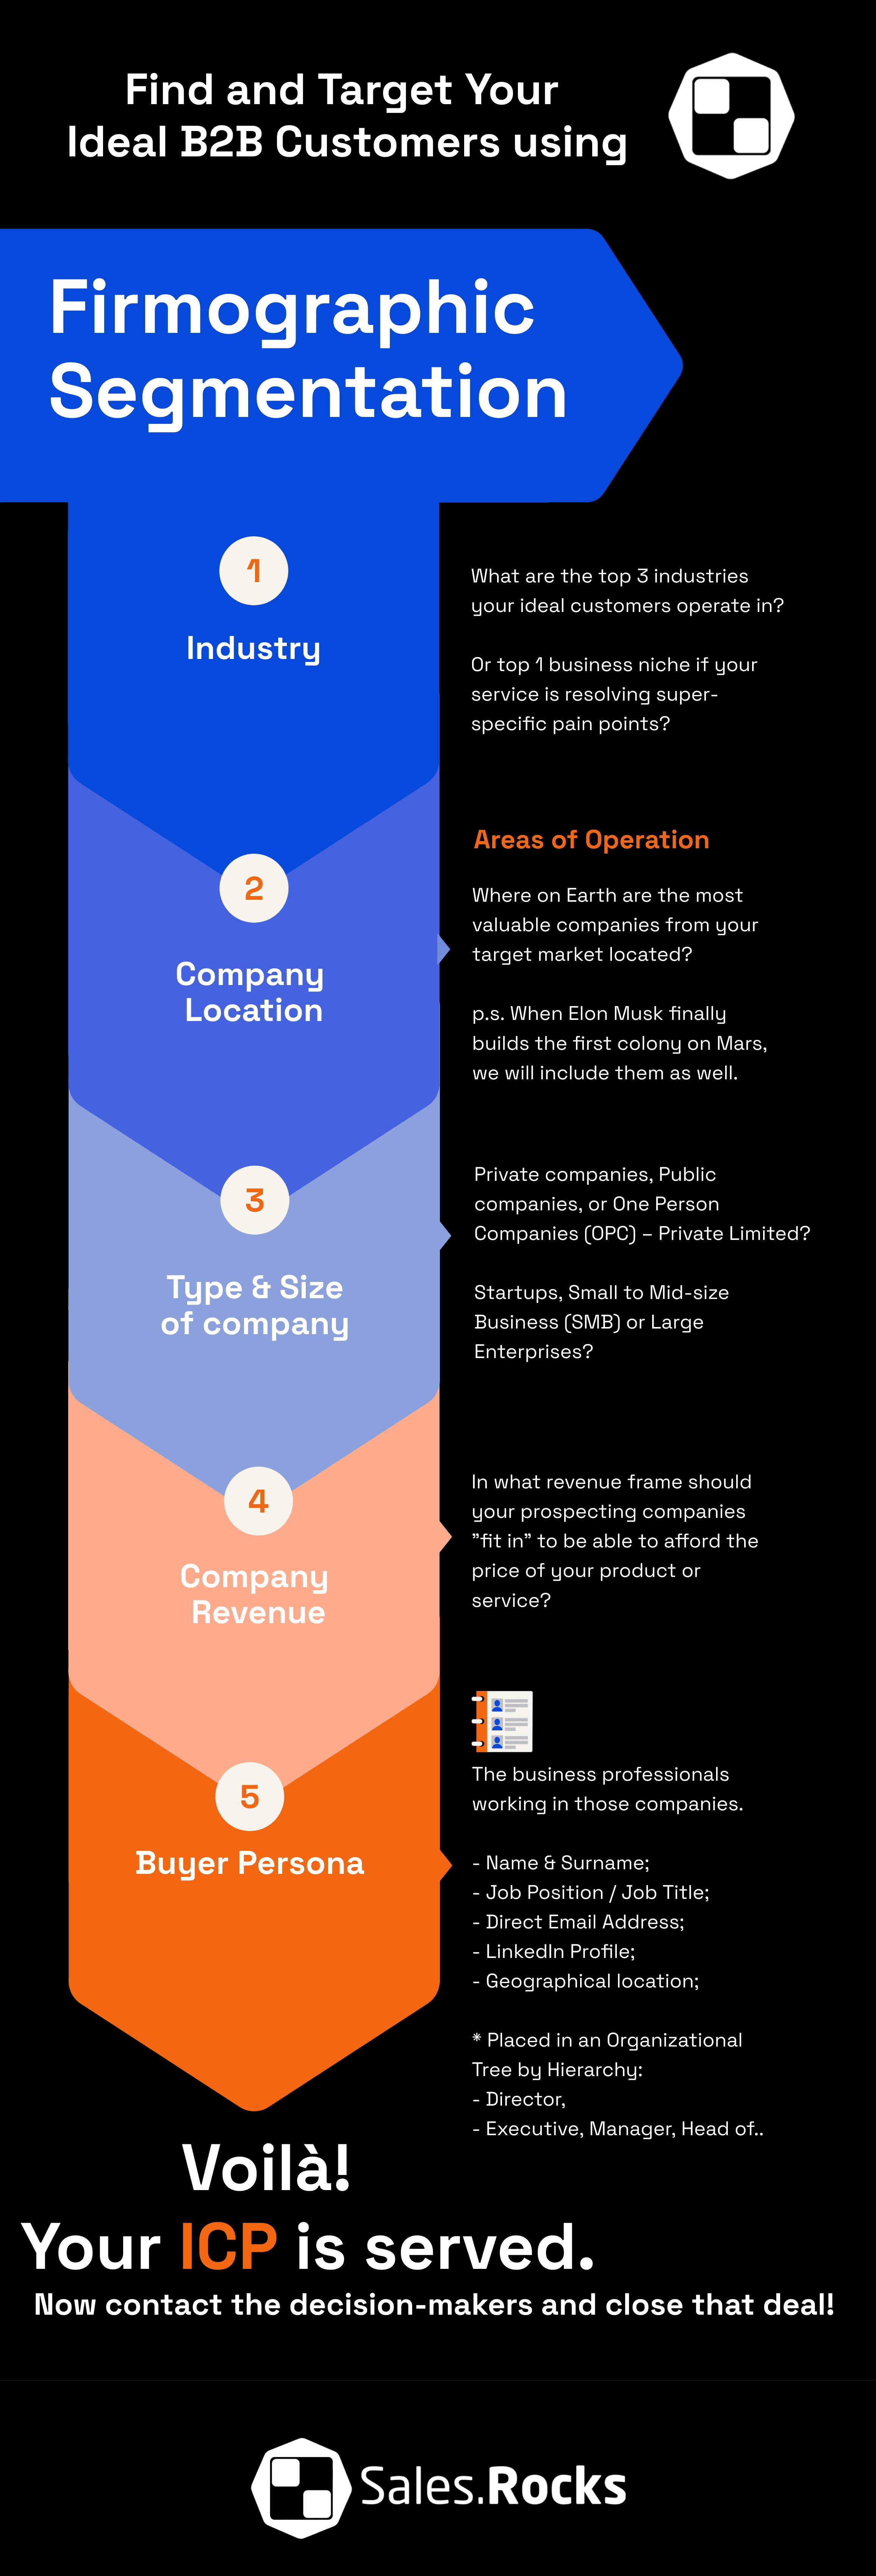 Firmographic Segmentation for Ideal Customer Profile